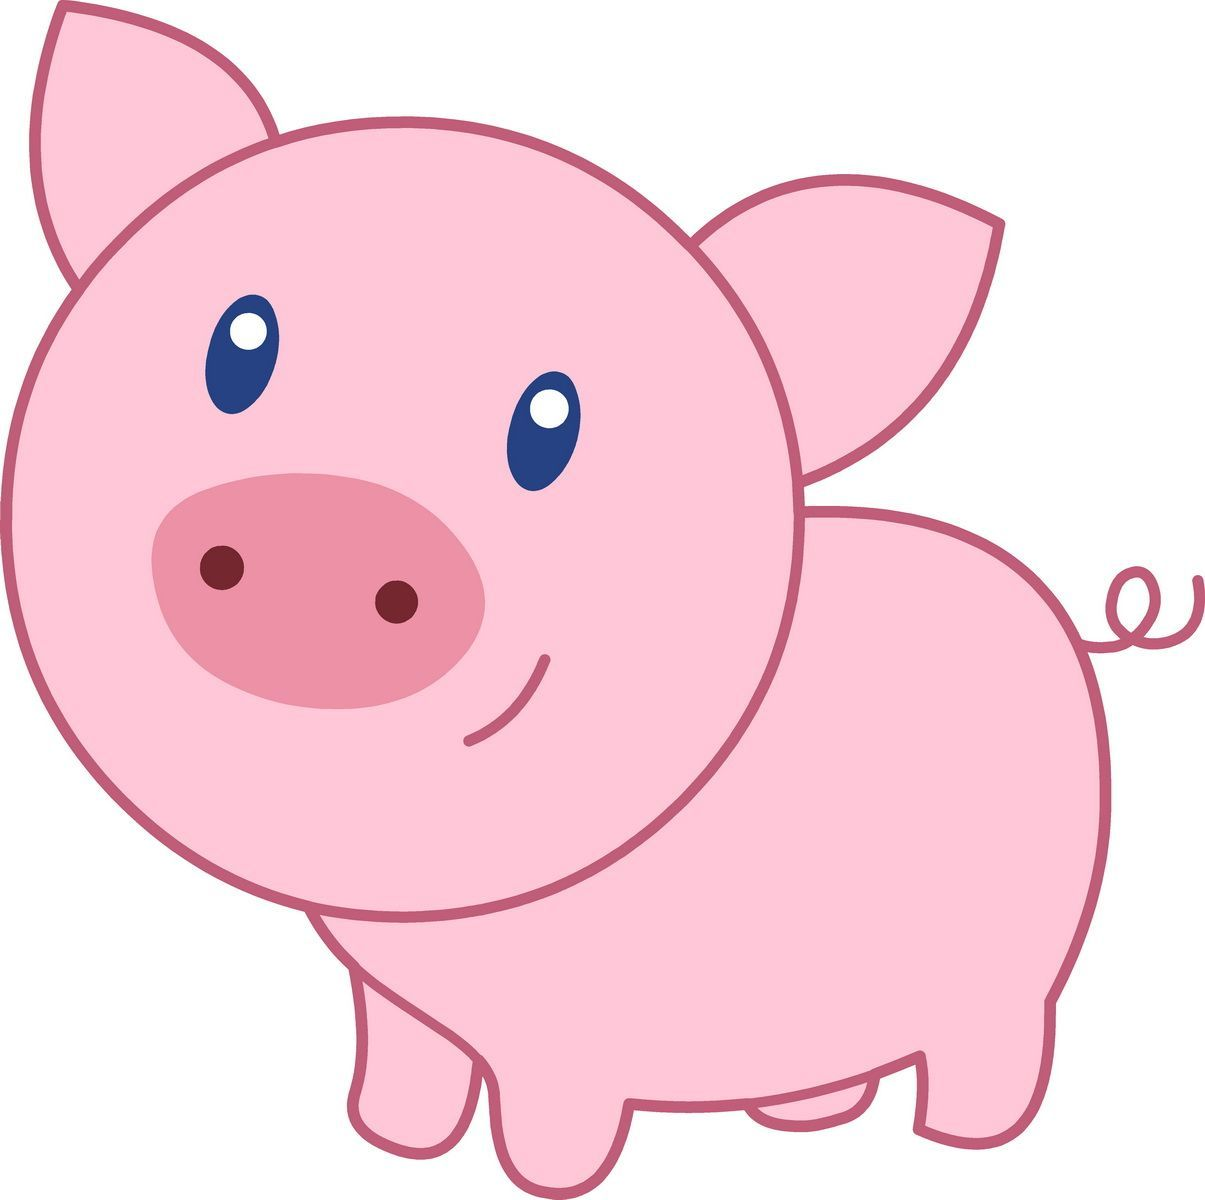 cute pigs cartoon wallpaper - photo #4